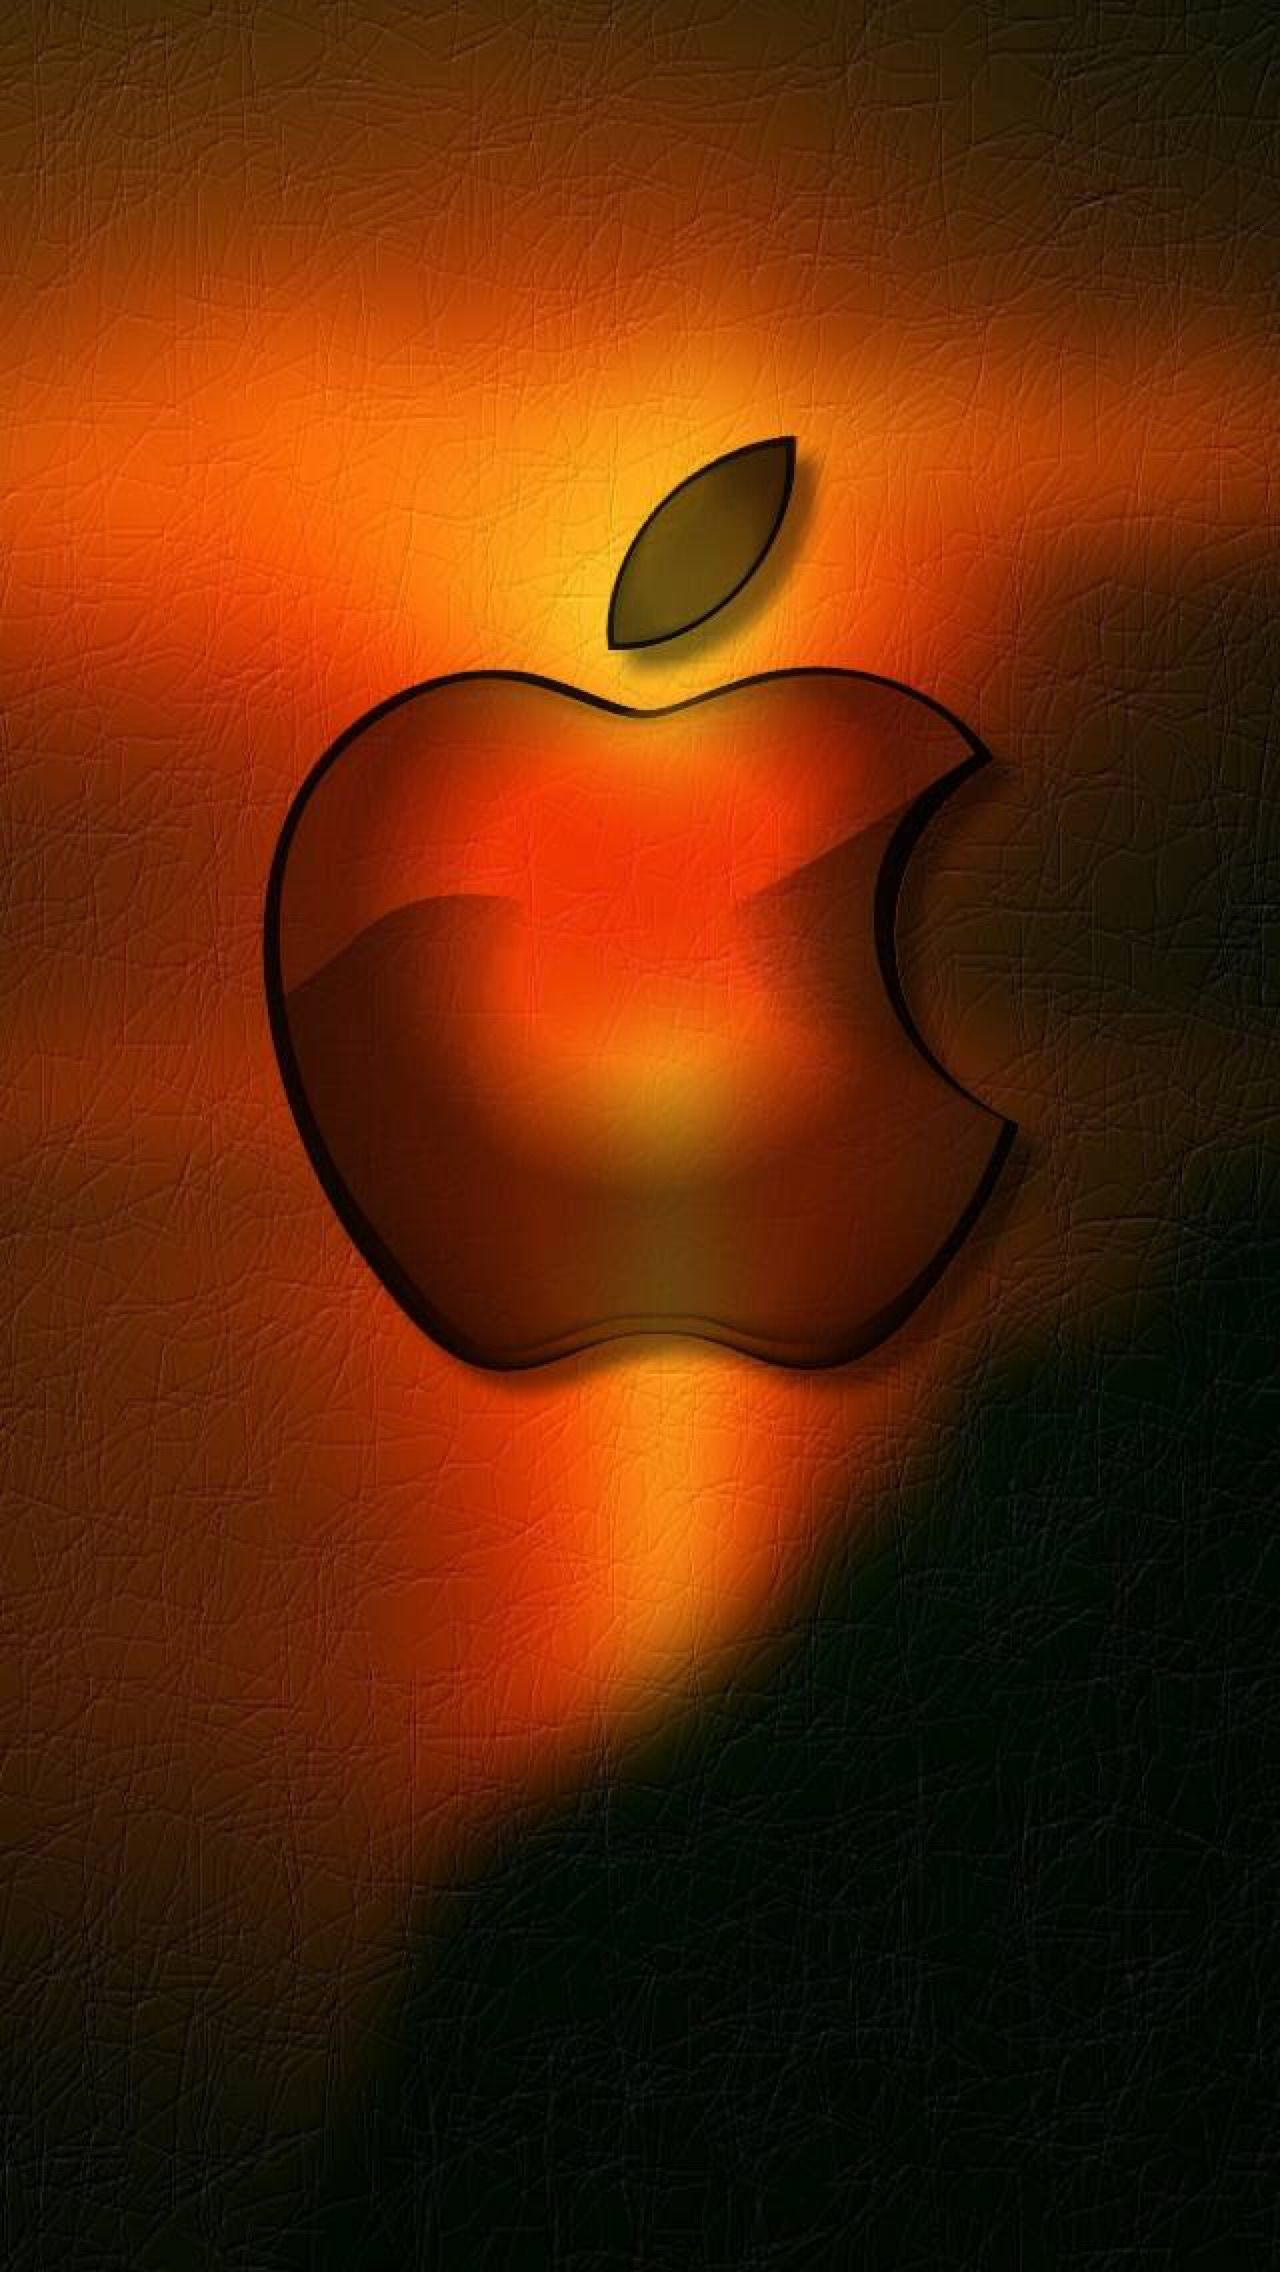 Apple wallpaper image by Mojgan on Appel Apple logo